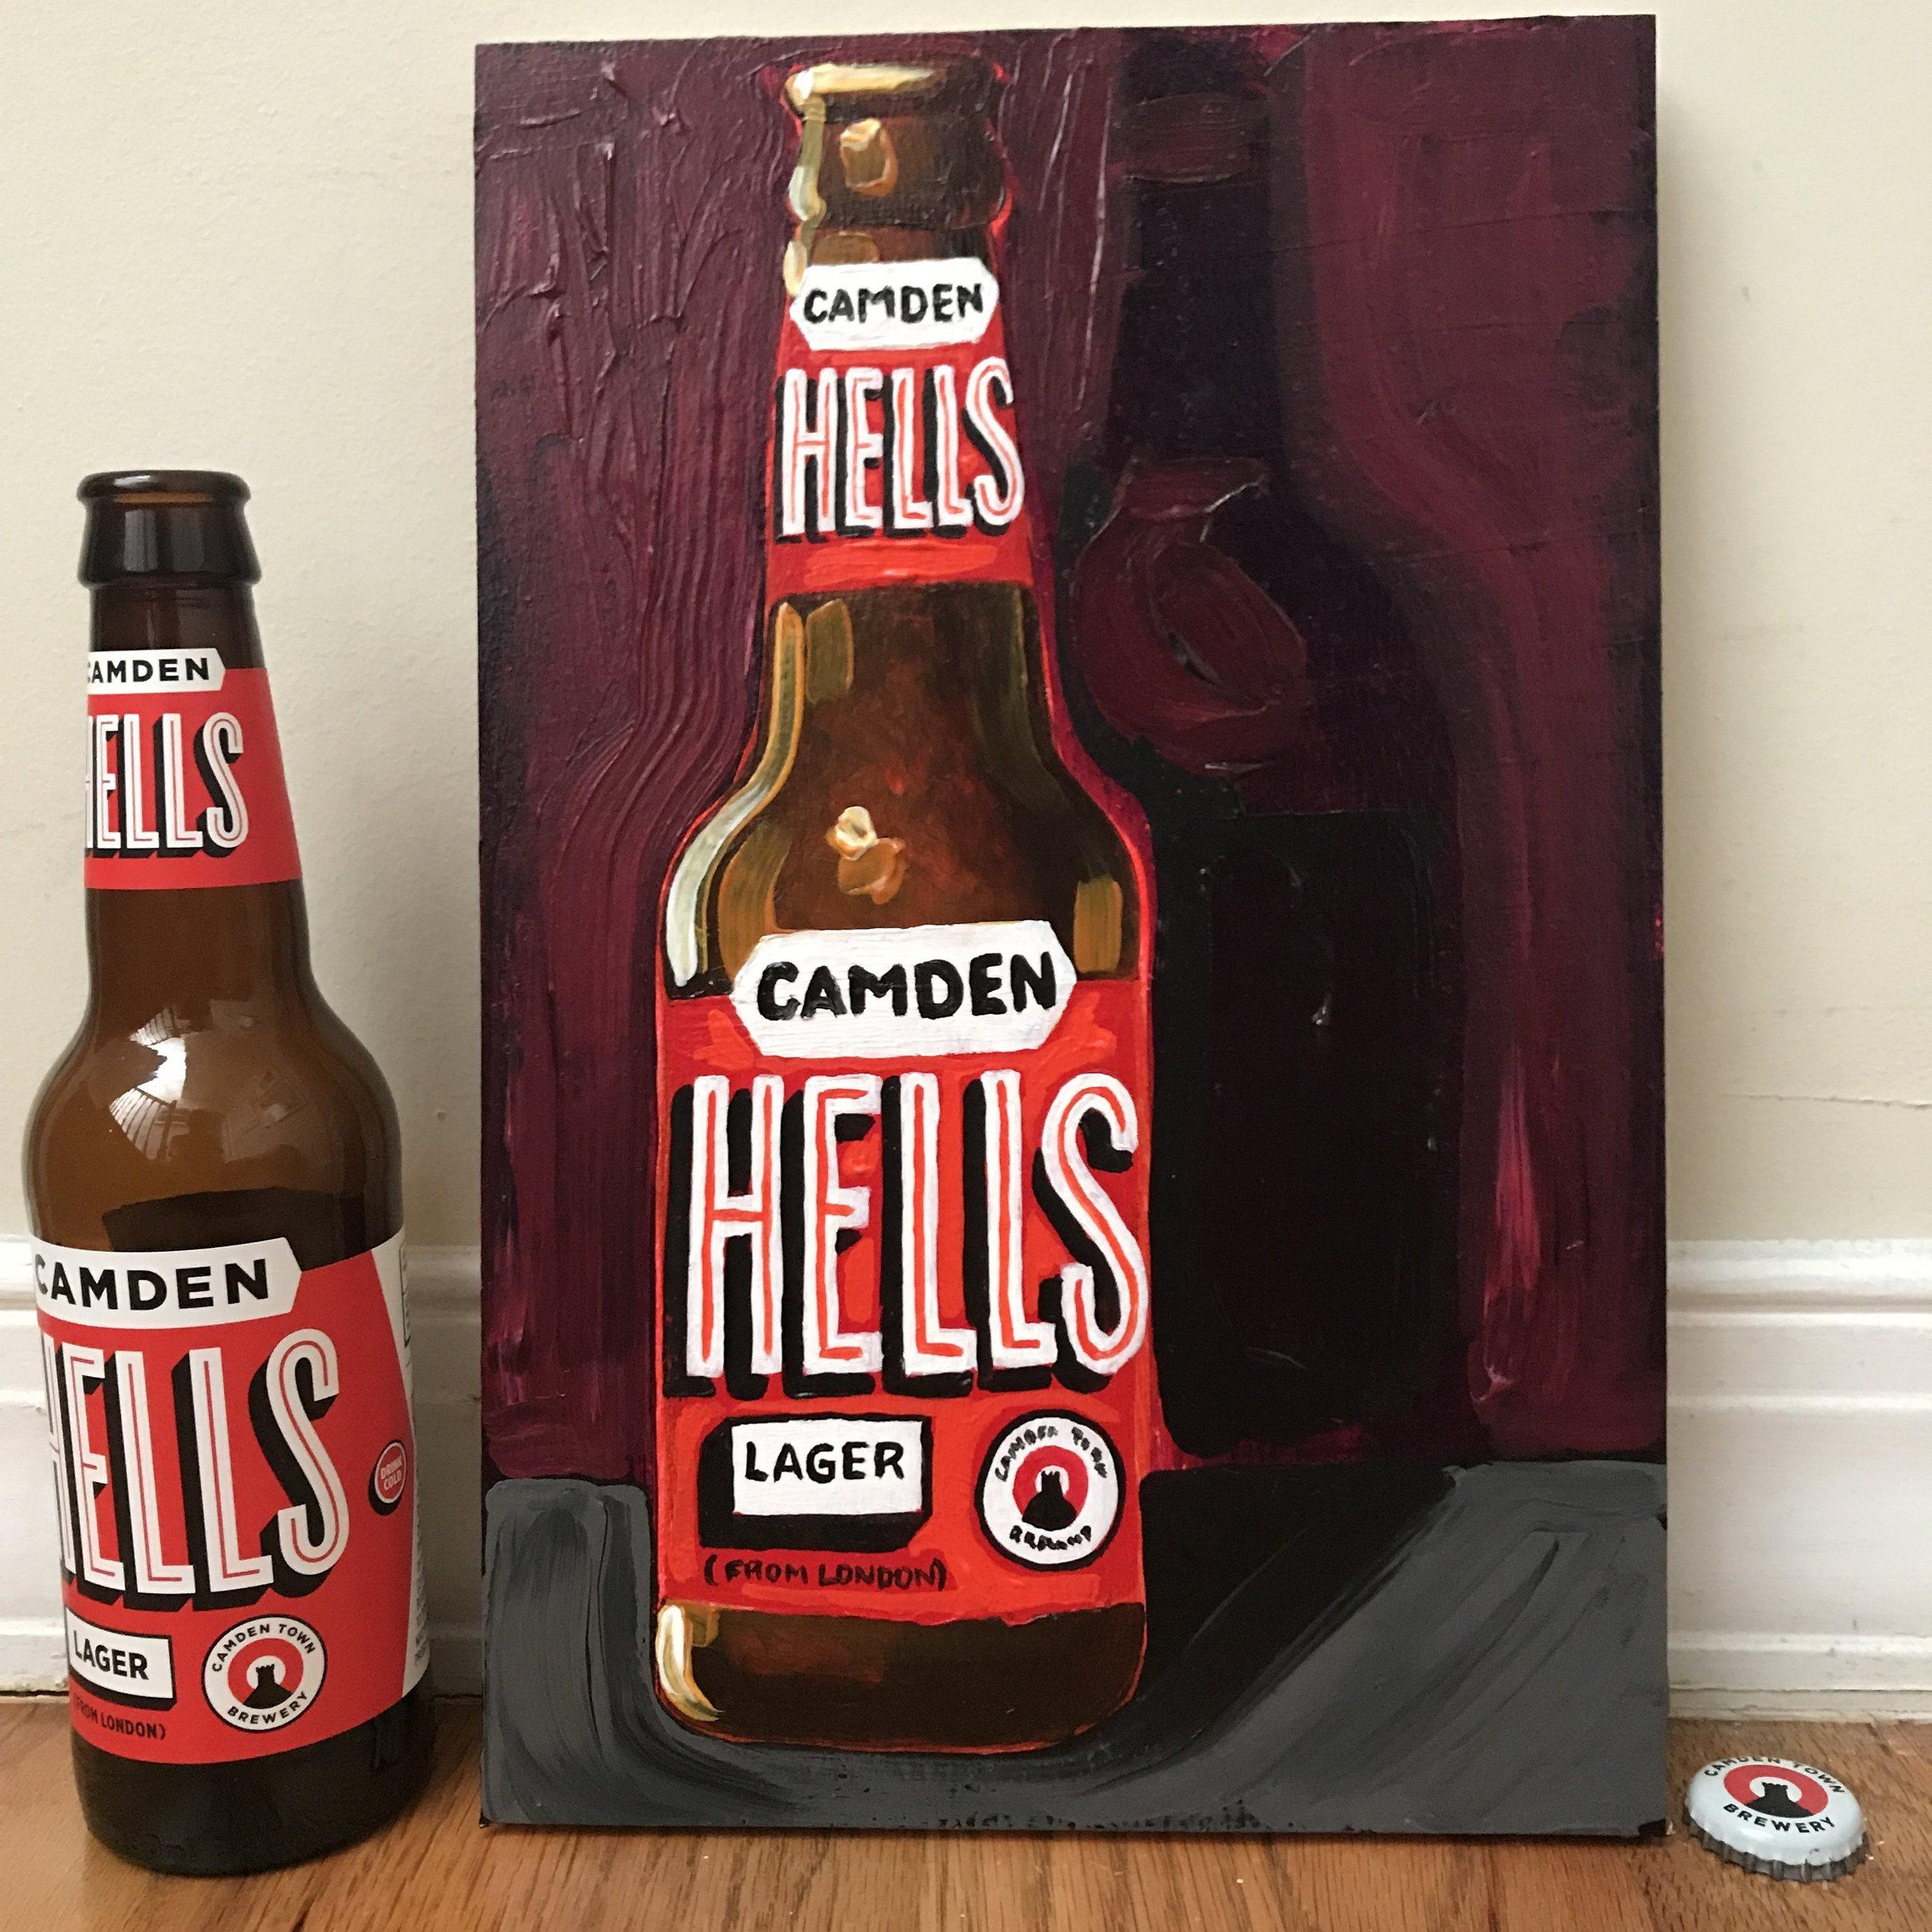 47 Camden Hells Lager (UK)